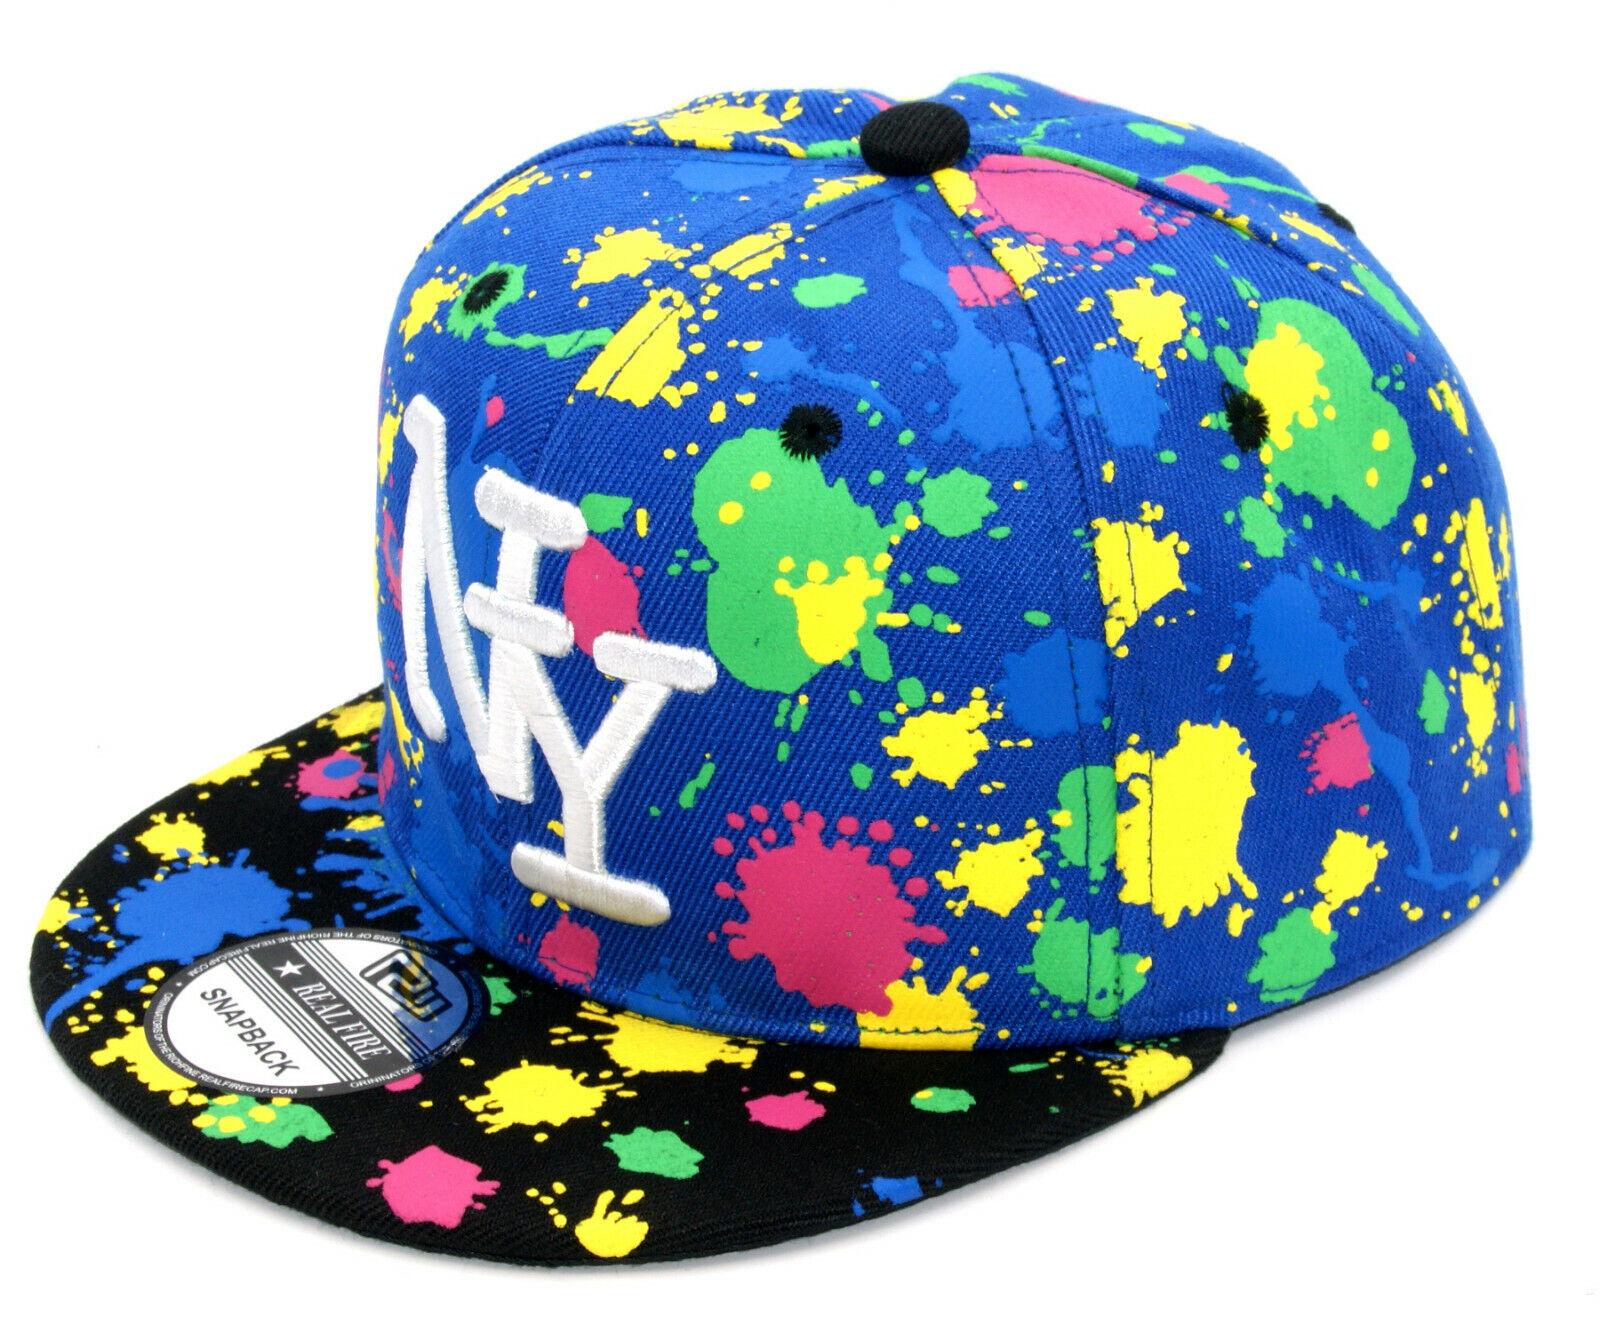 Snapback Cappy Kinder Kids Junge Cap Basecap Kappe Schirmmütze NY Klekse blau